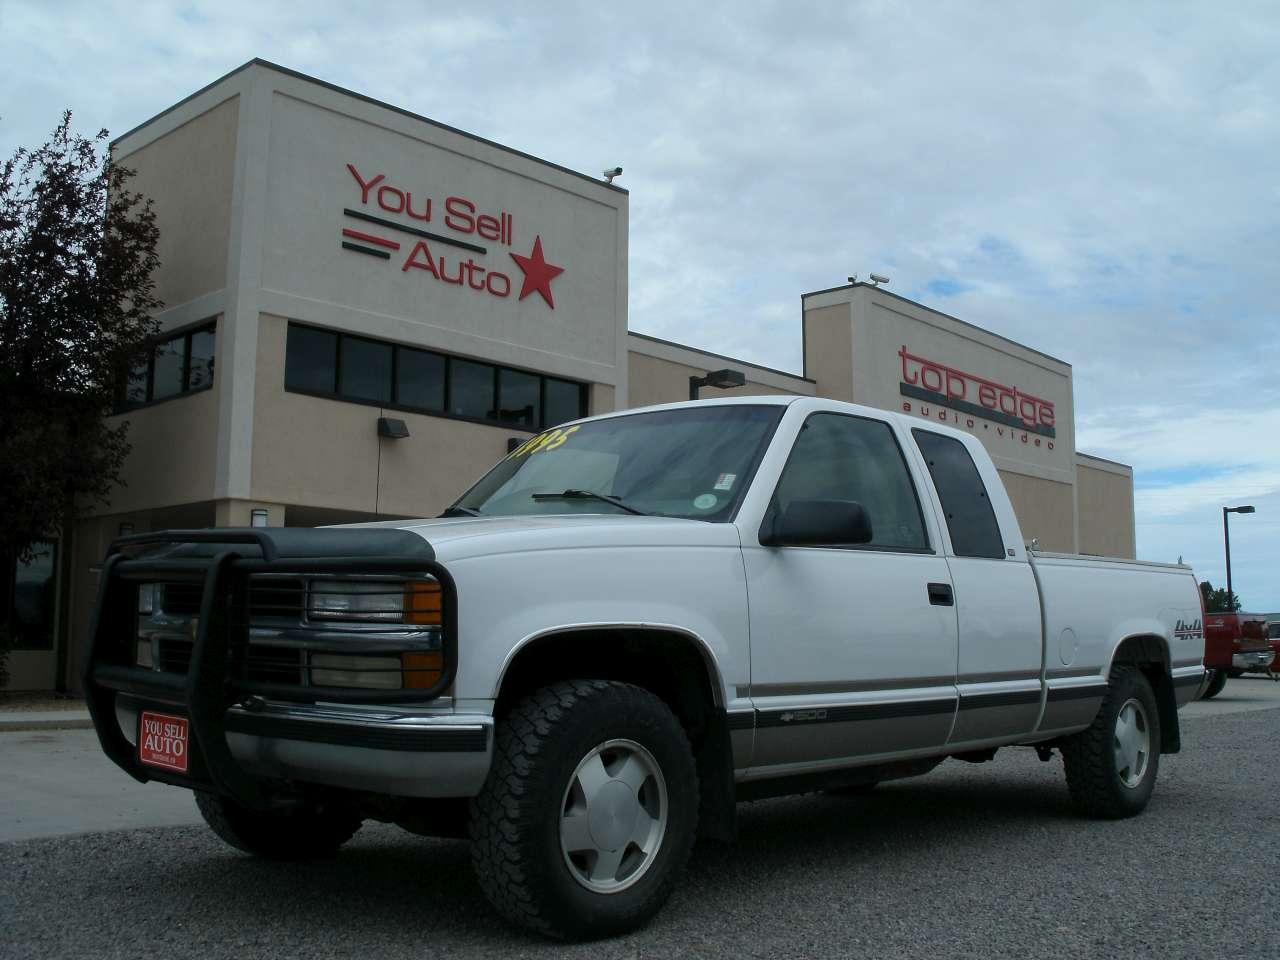 You sell auto 1998 chevrolet silverado 1500 sold